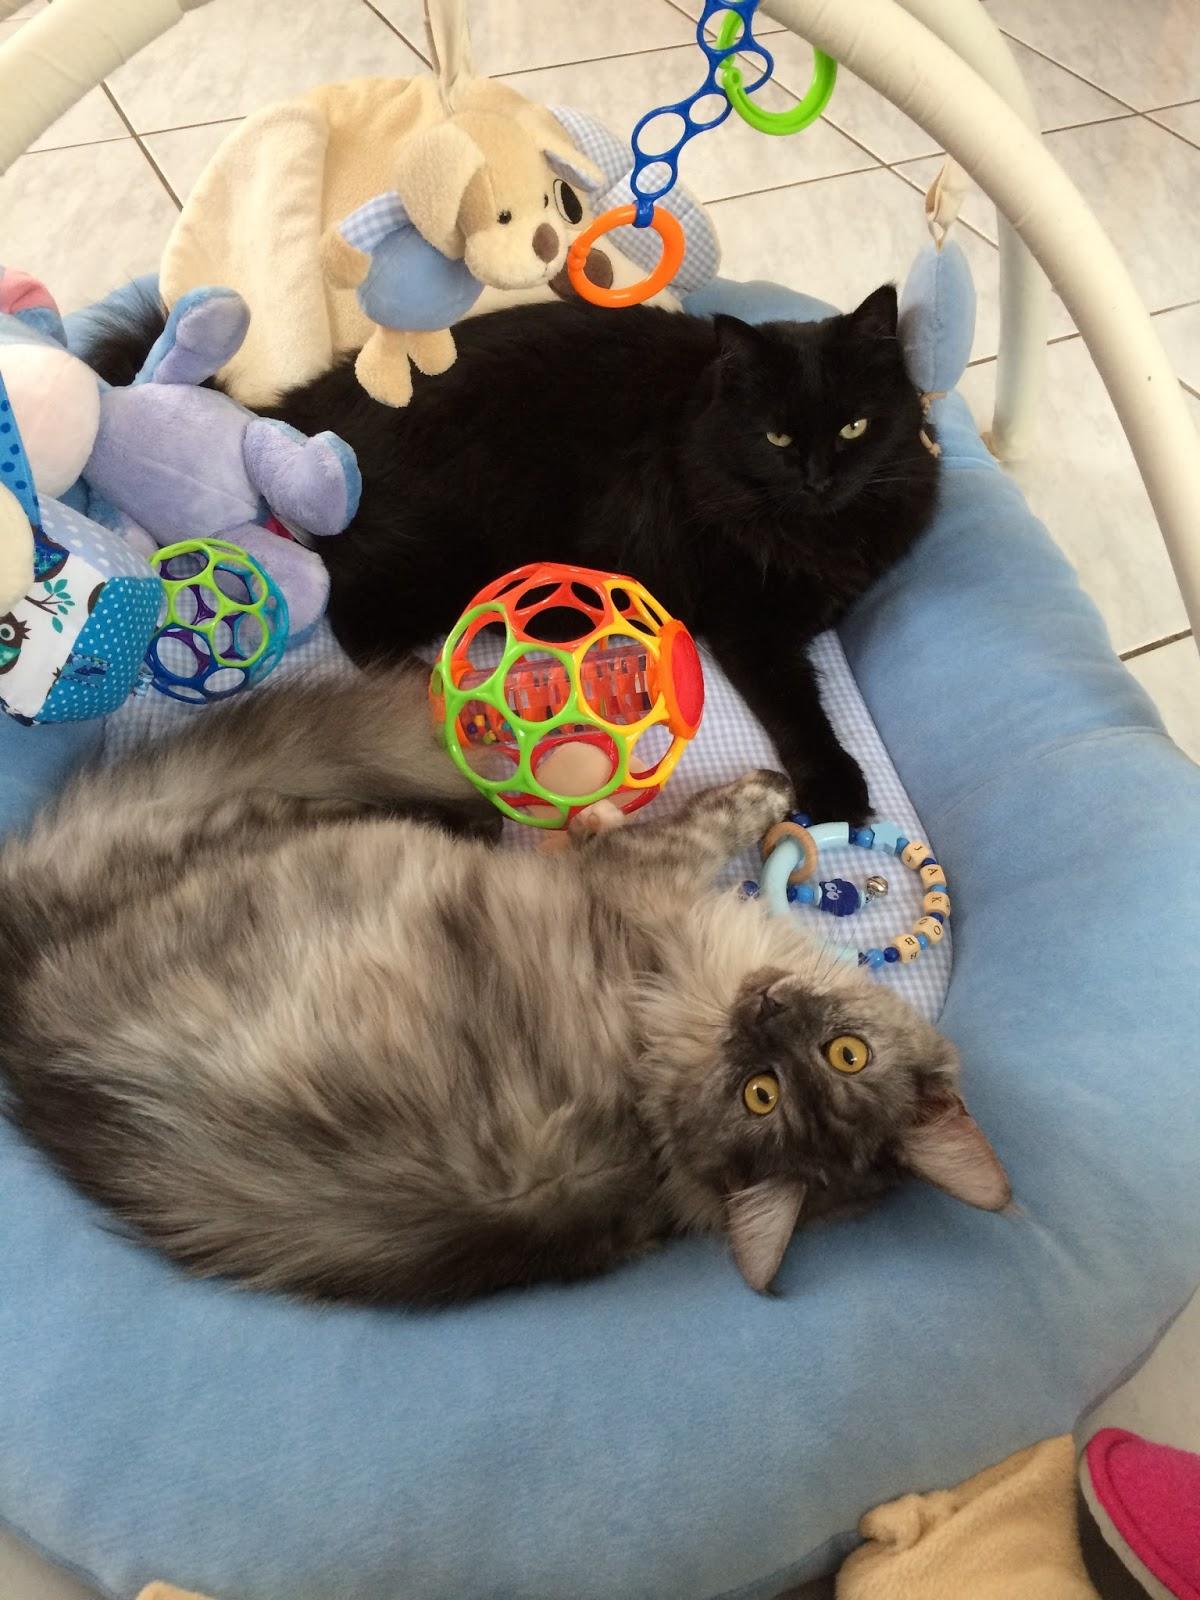 Freebooktratsch Bekis-scrapcats mit dem Mäppchen2